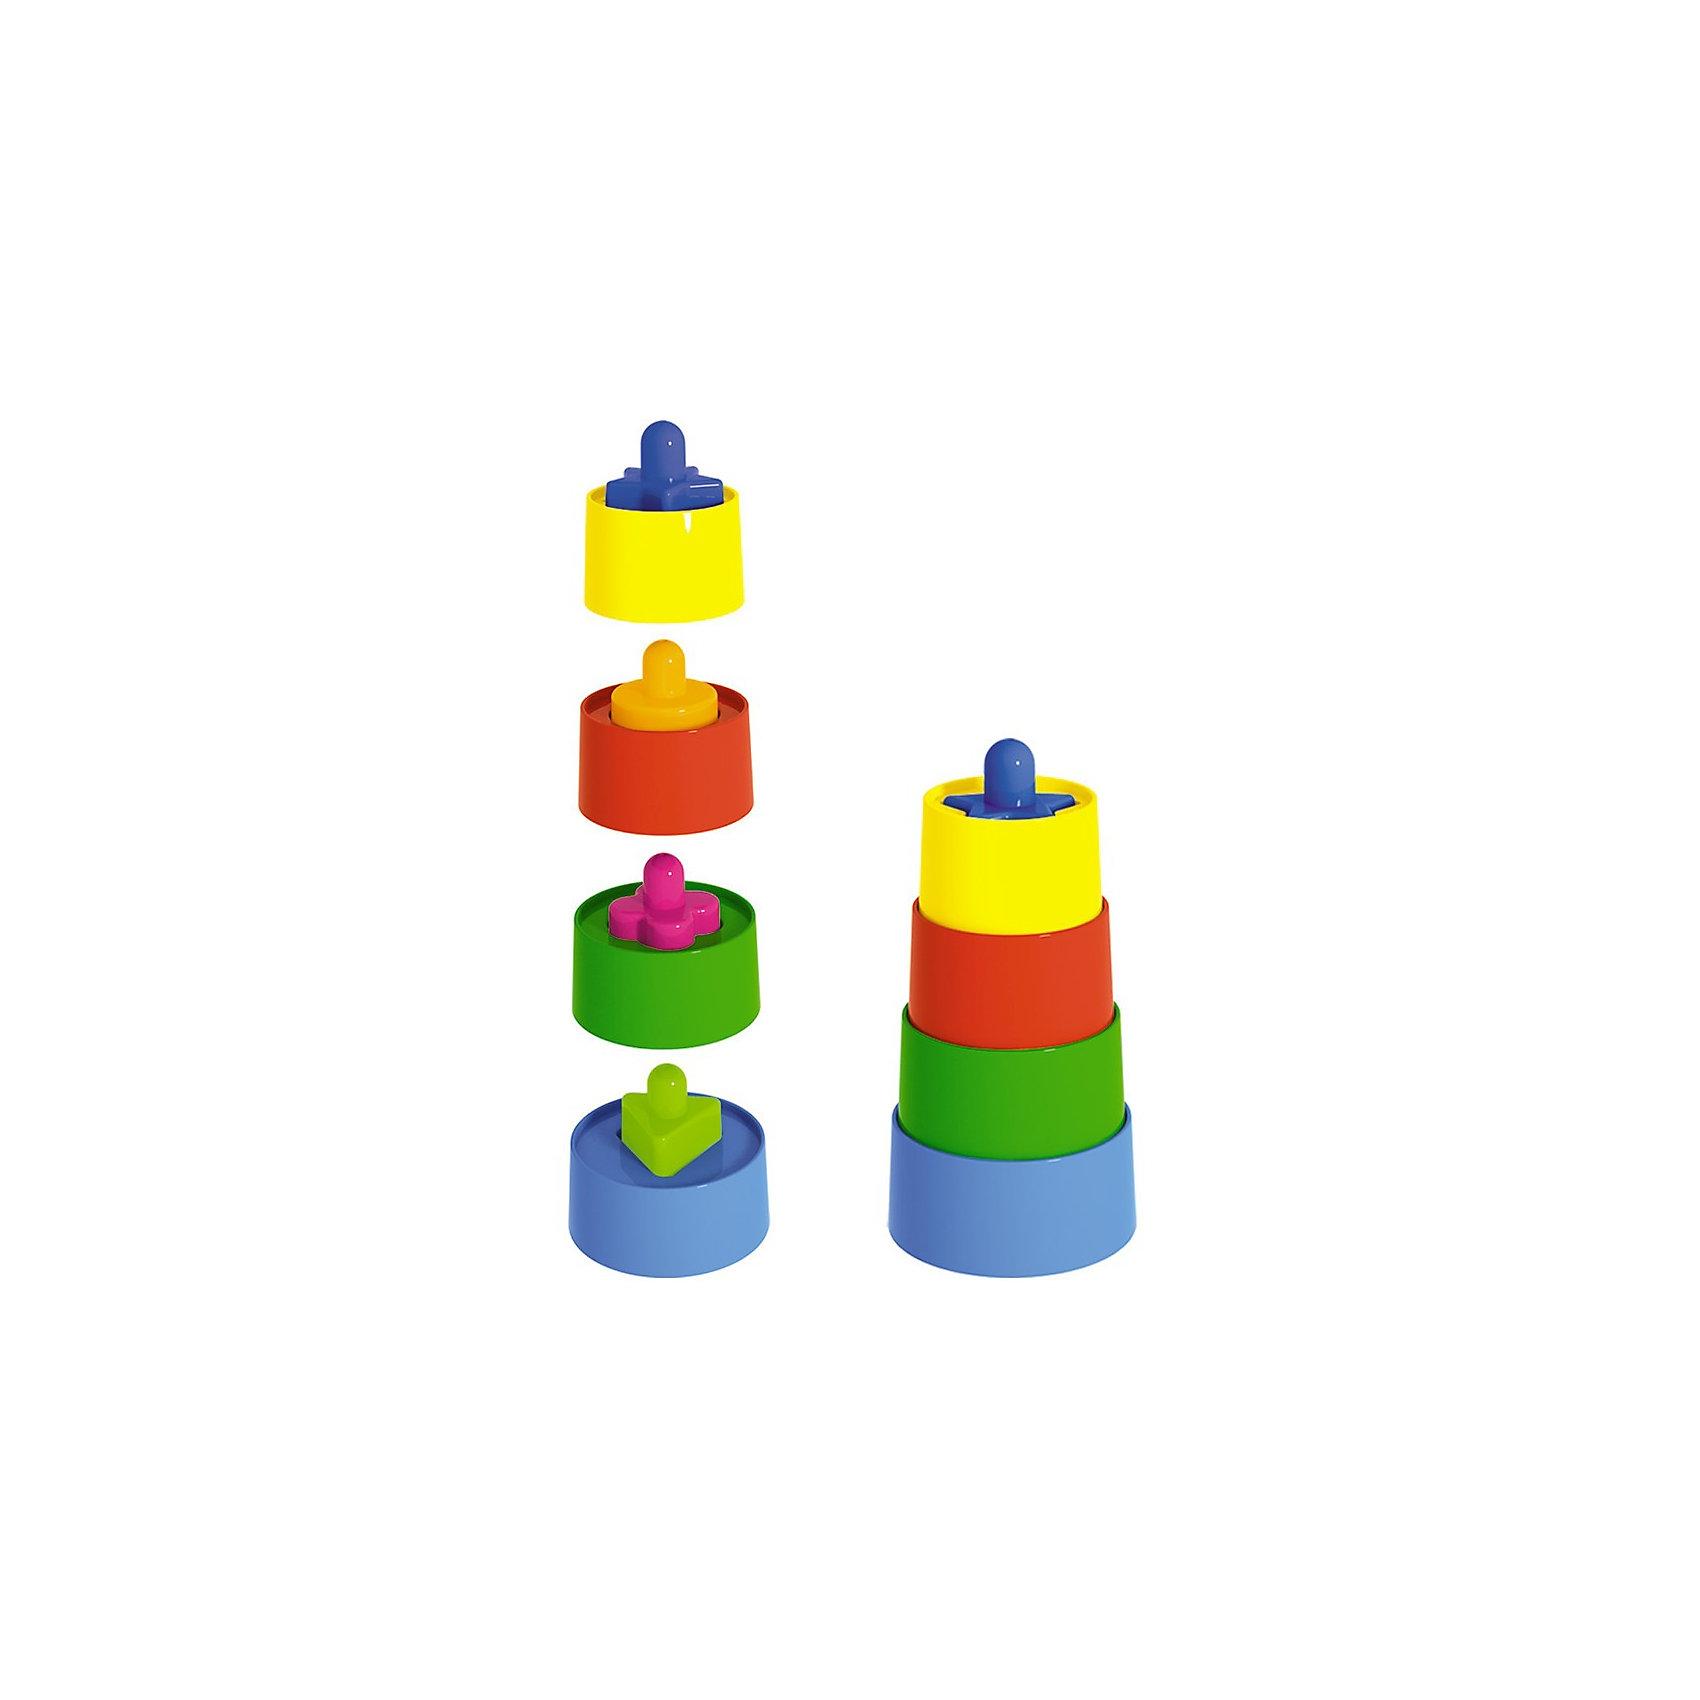 Стеллар Пирамидка Матрешка краснокамская игрушка развивающая пирамидка кольцевая